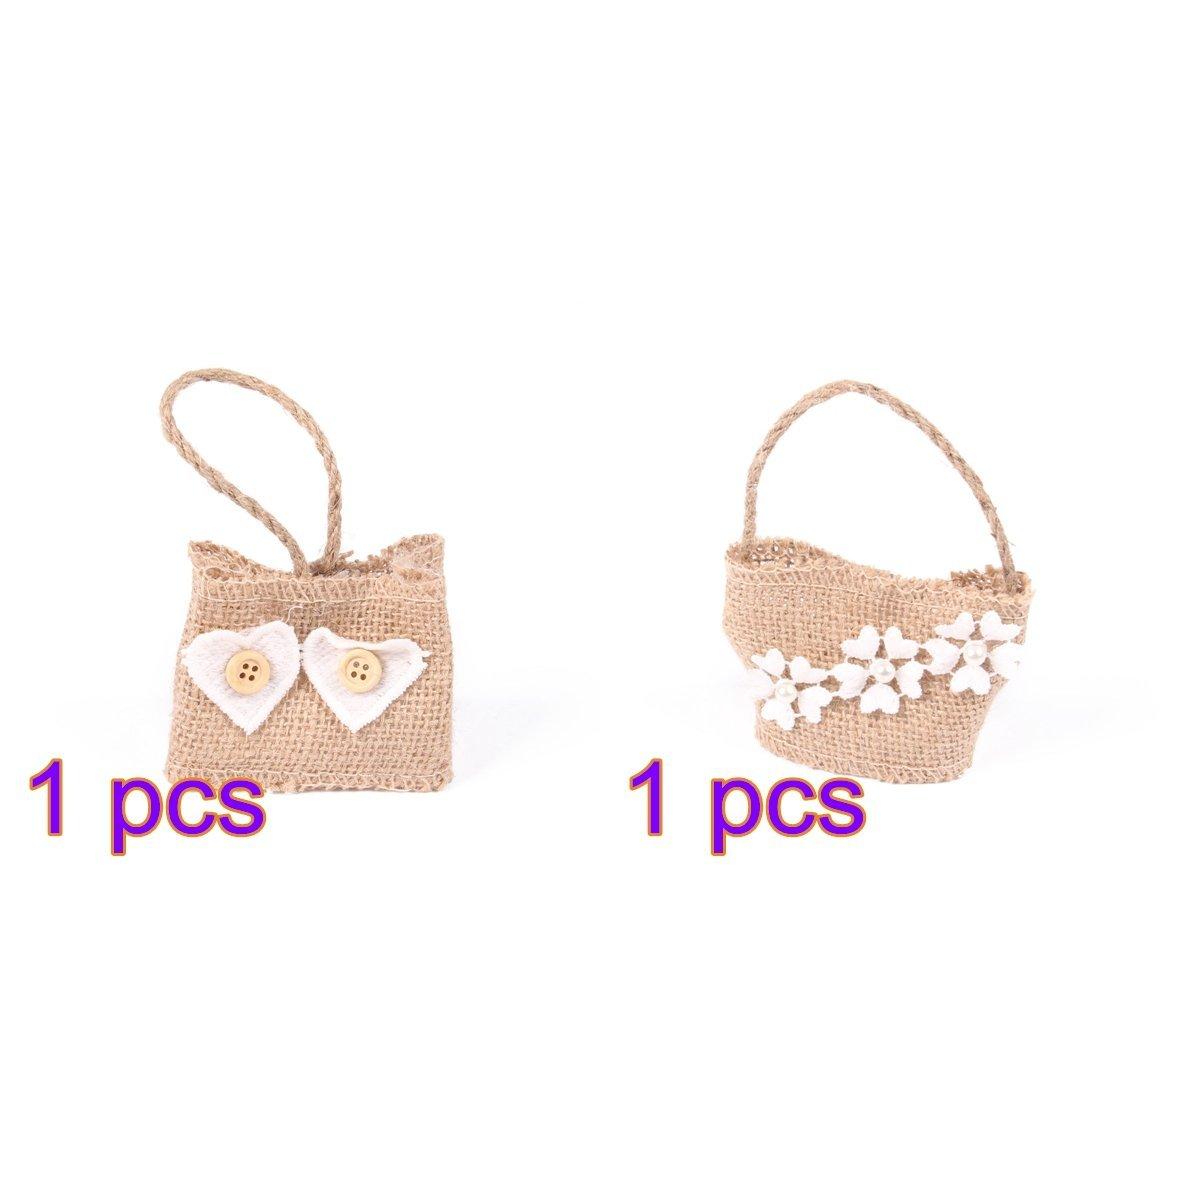 Buy Tinksky Christmas Gift Bags Linen Drawstring Bags Birthday Gift ...